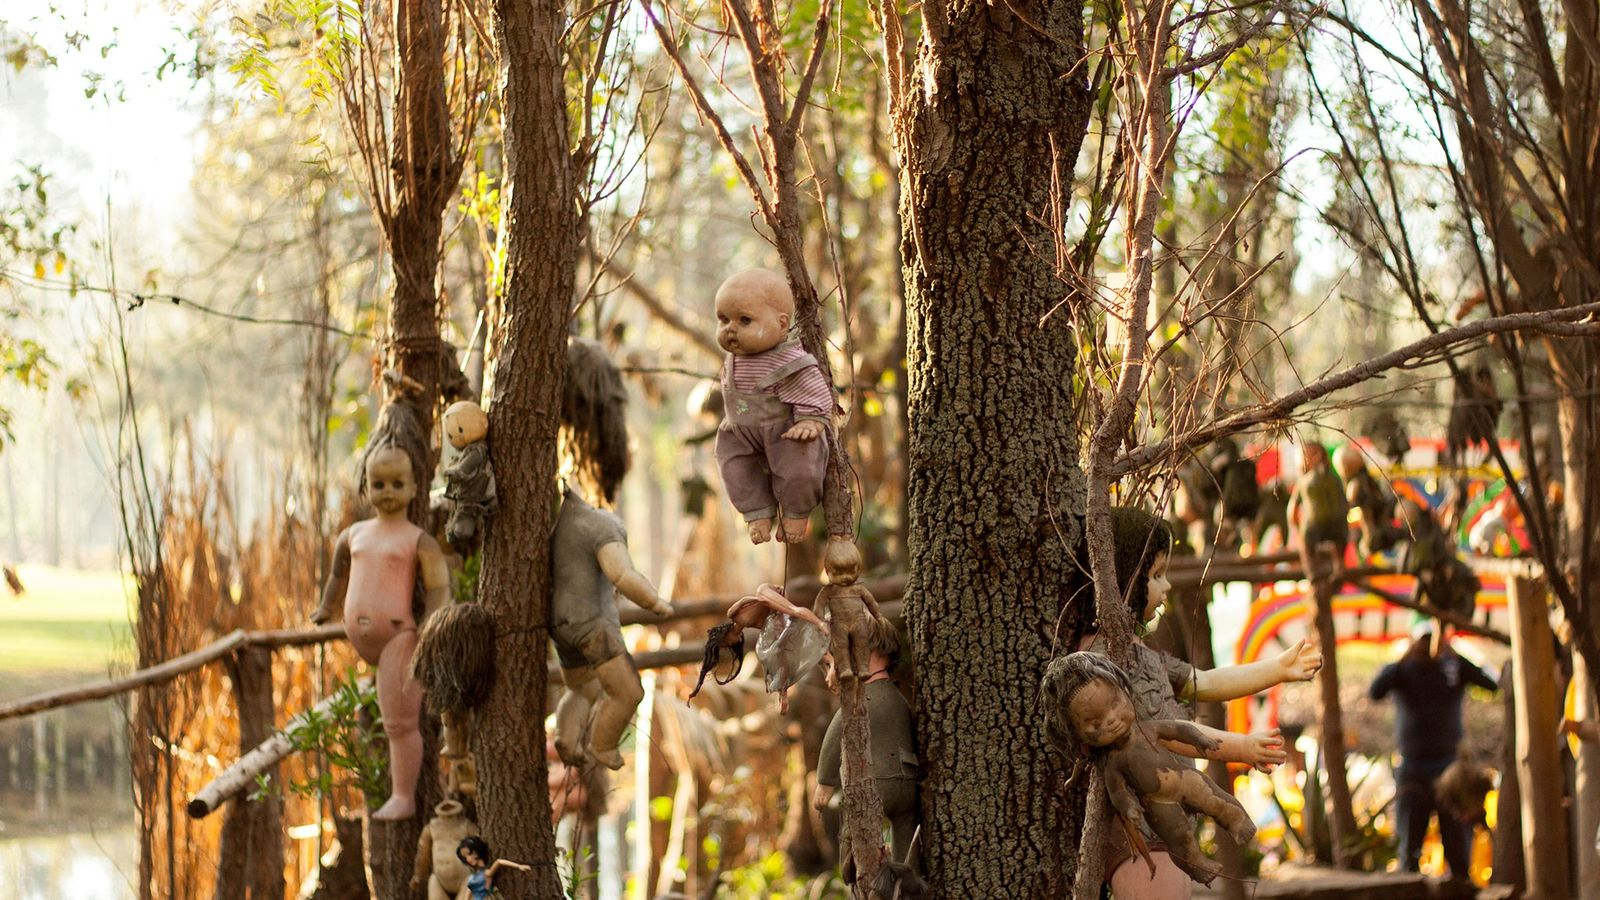 Island of Dolls, Mexico